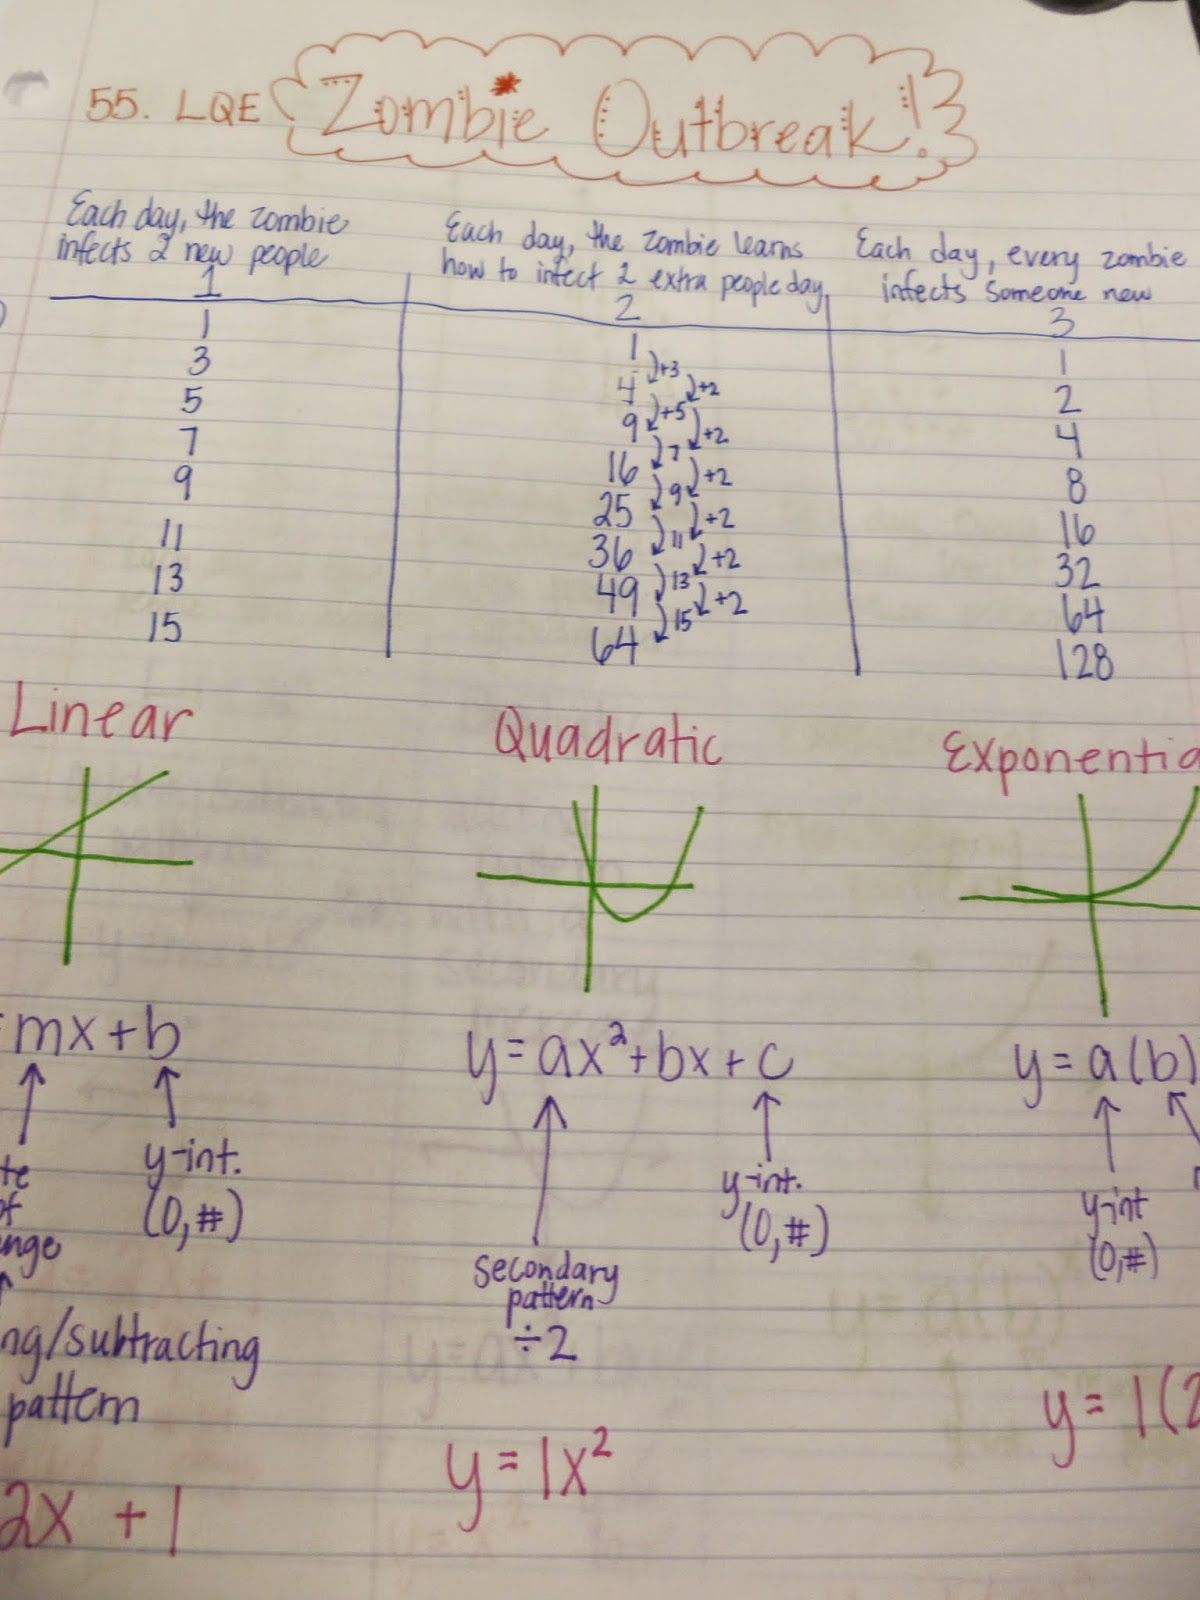 24 Linear Quadratic Exponential Functions Ideas Exponential Functions Quadratics High School Math